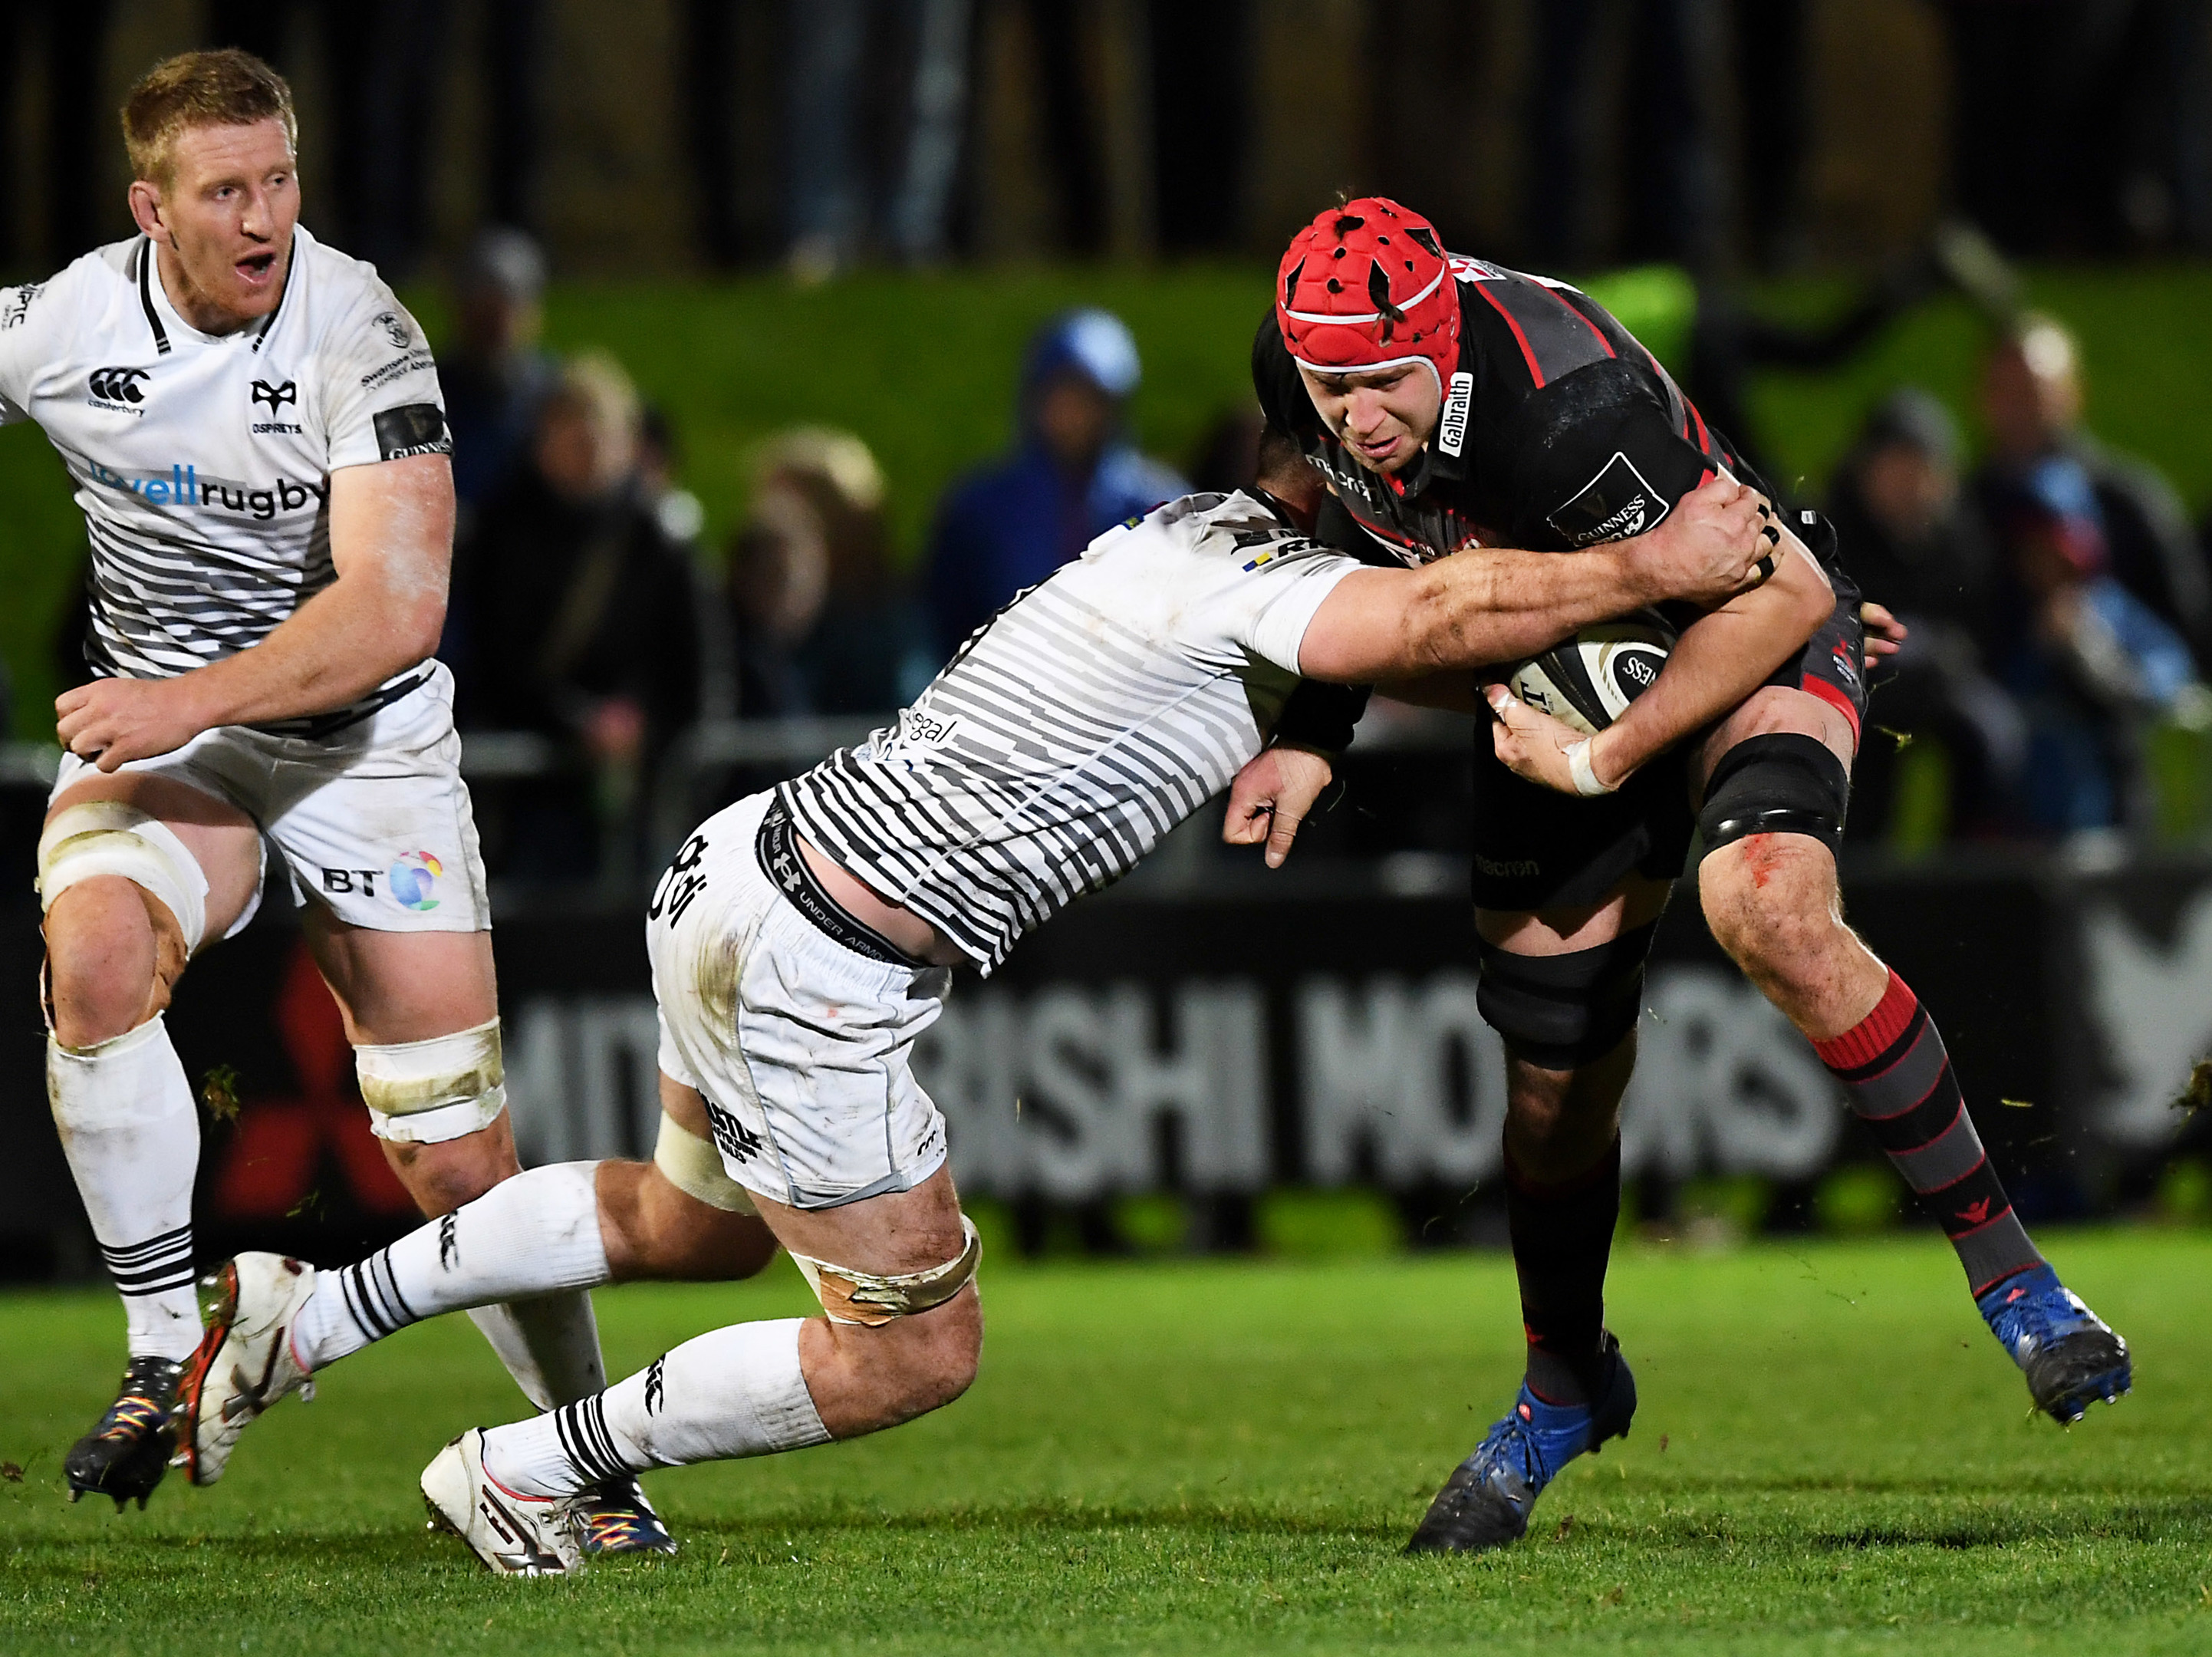 Edinburgh's Grant Gilchrist makes a powerful carry against Ospreys at Myreside.